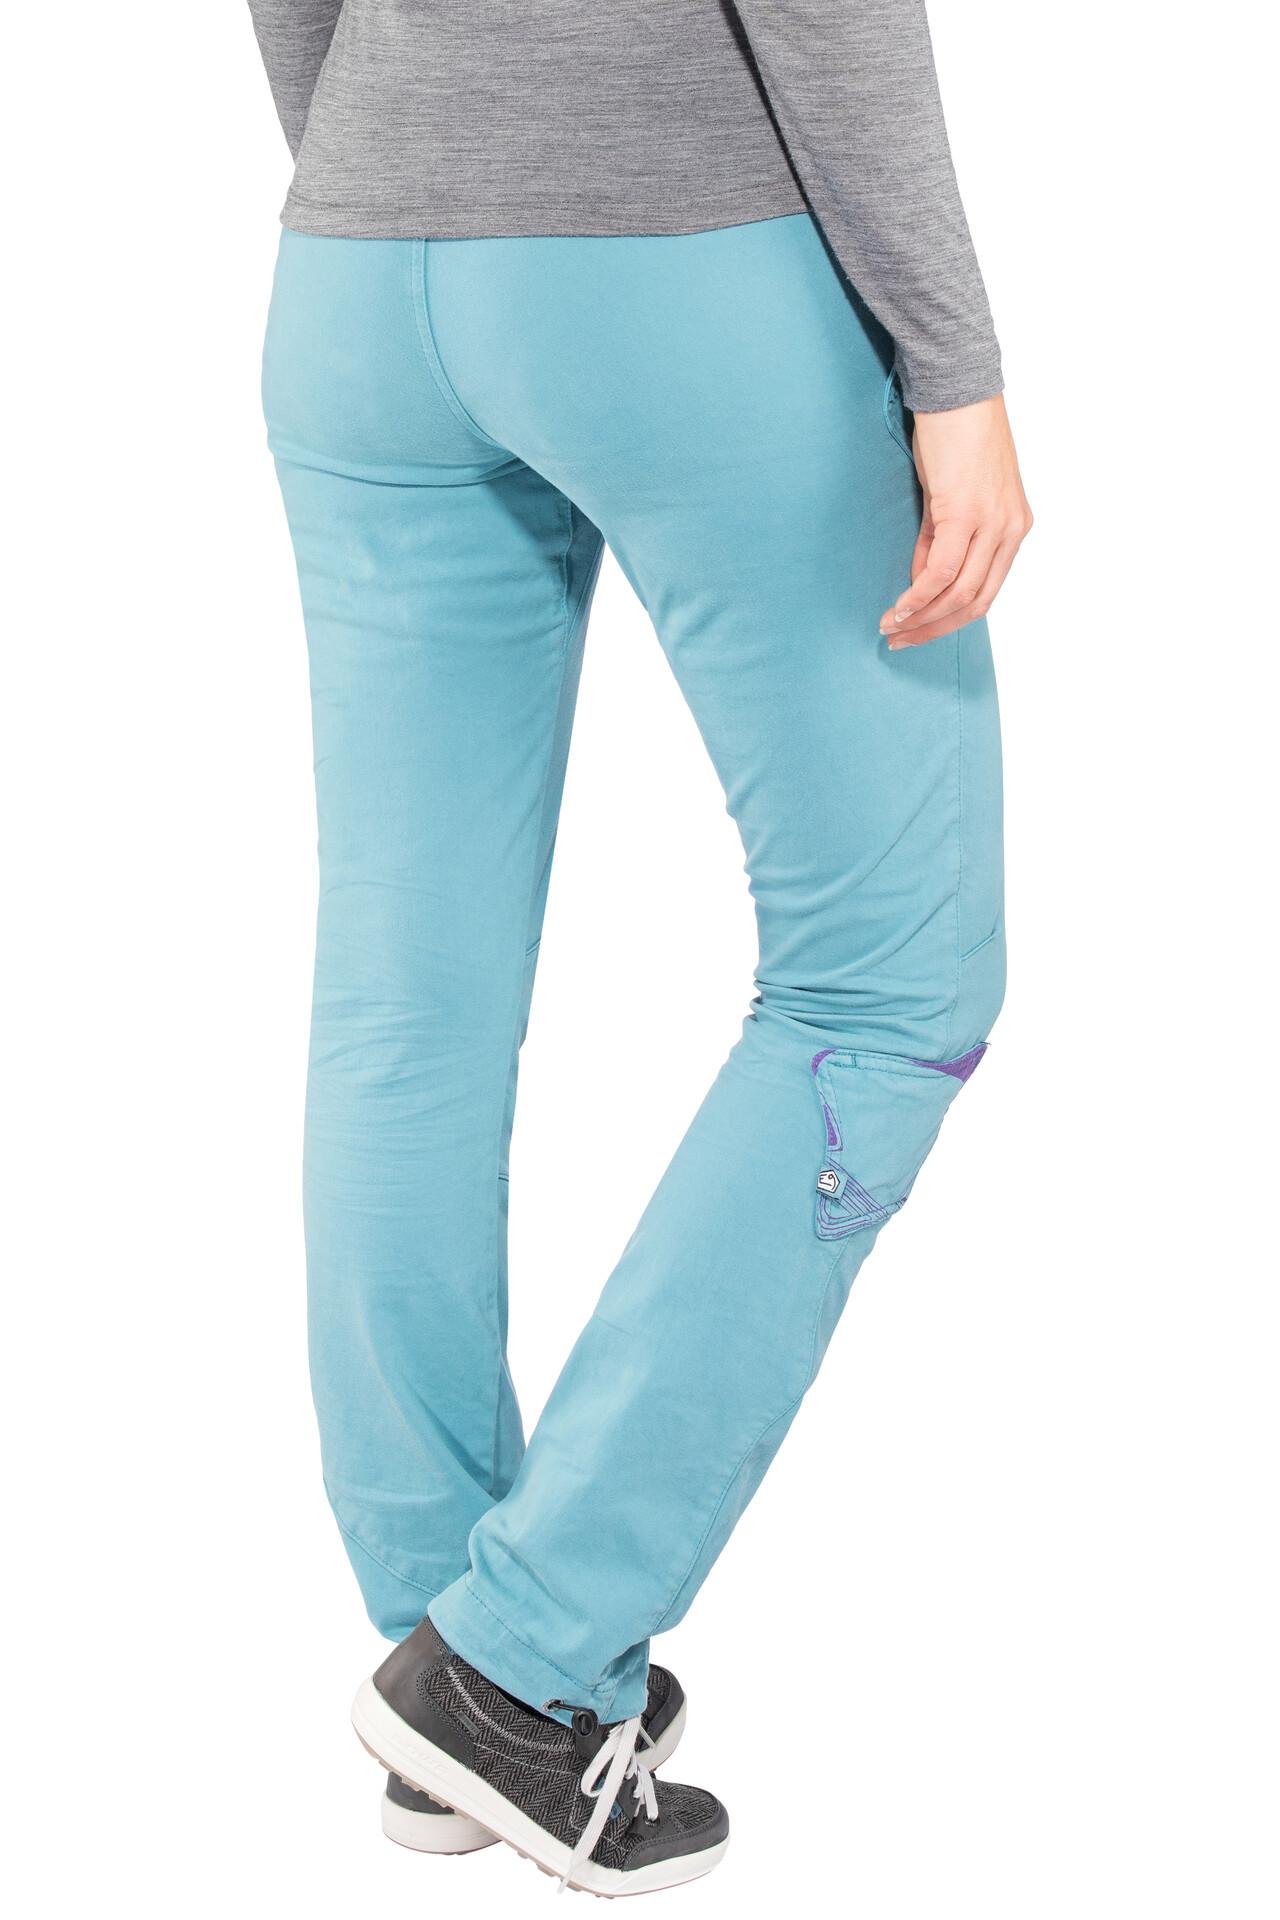 Pantalon E9 Pantalon Pantalon FemmeDust FemmeDust Elly E9 Elly E9 E9 FemmeDust Elly PXZuOiTk